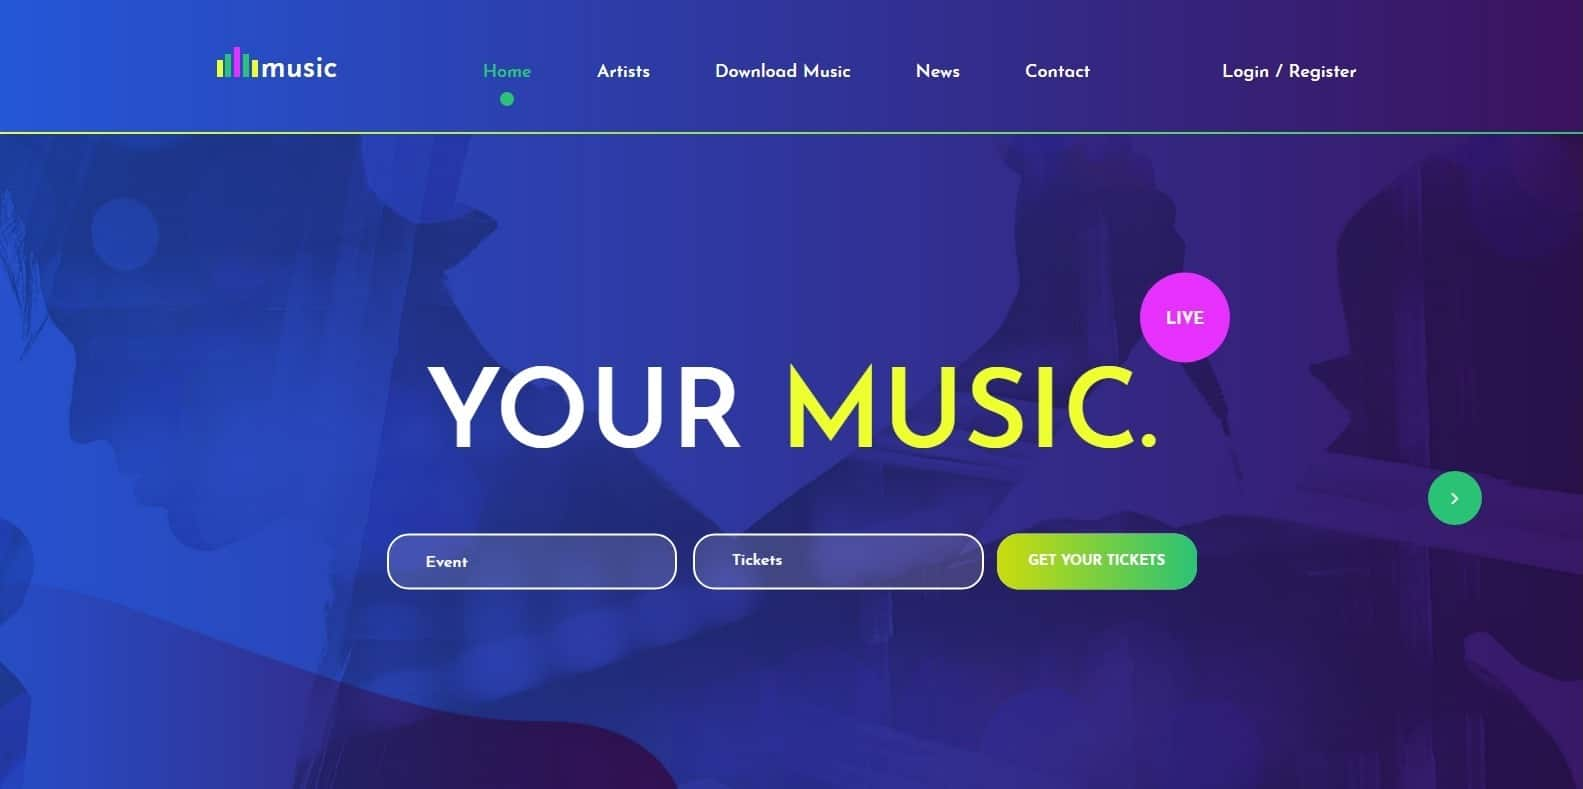 music2-html-free-music-template